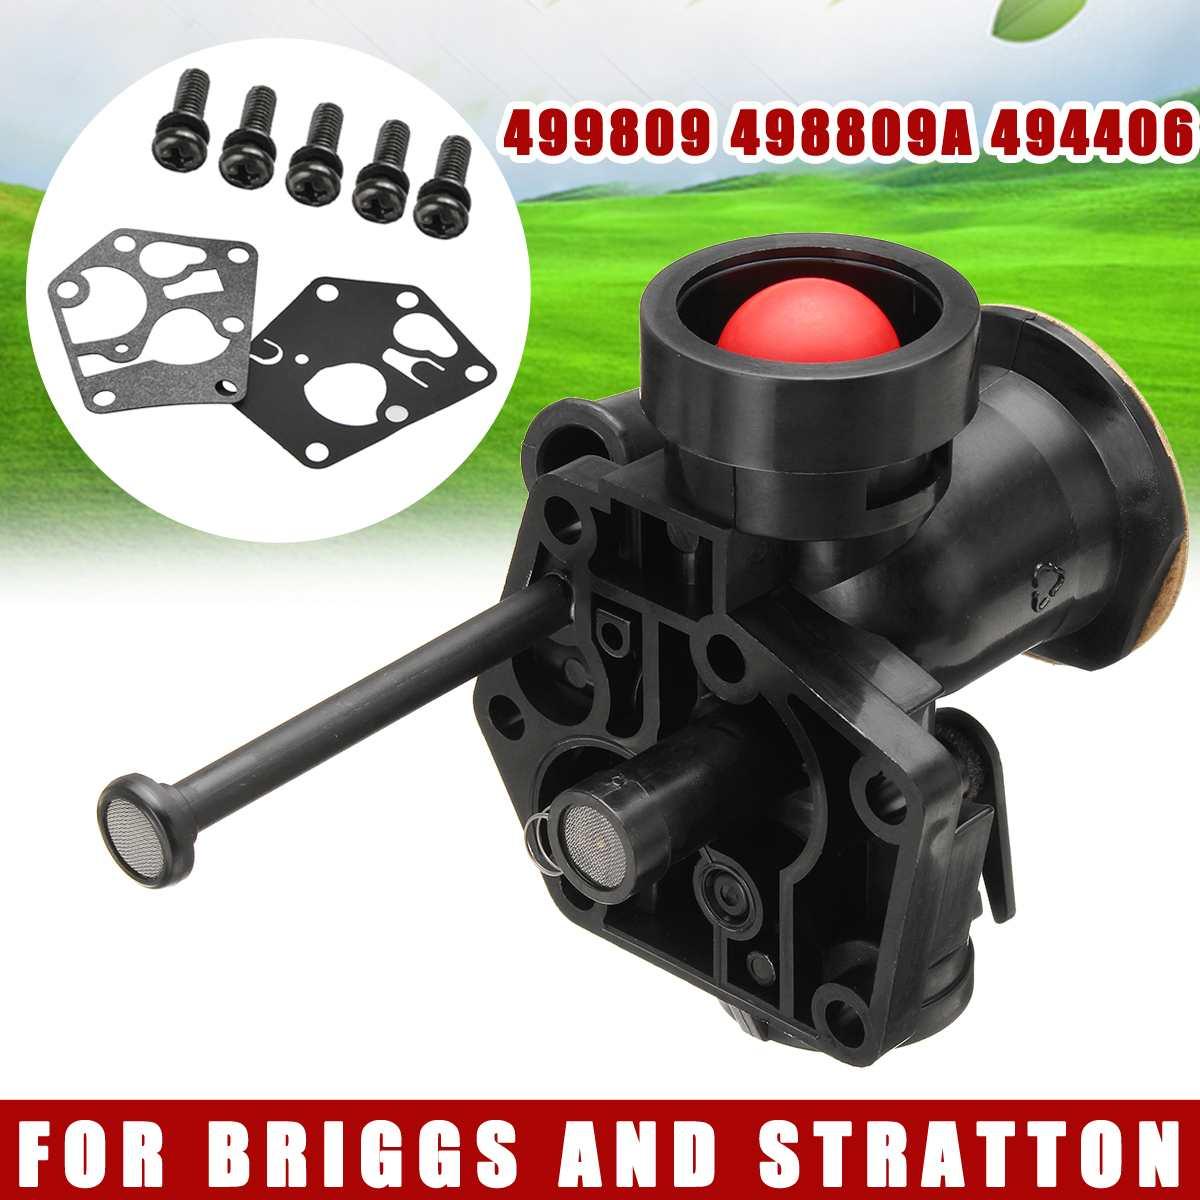 Grass Trimmer Carburetor Carb Assembly For Briggs And Stratton 499809 498809A 494406